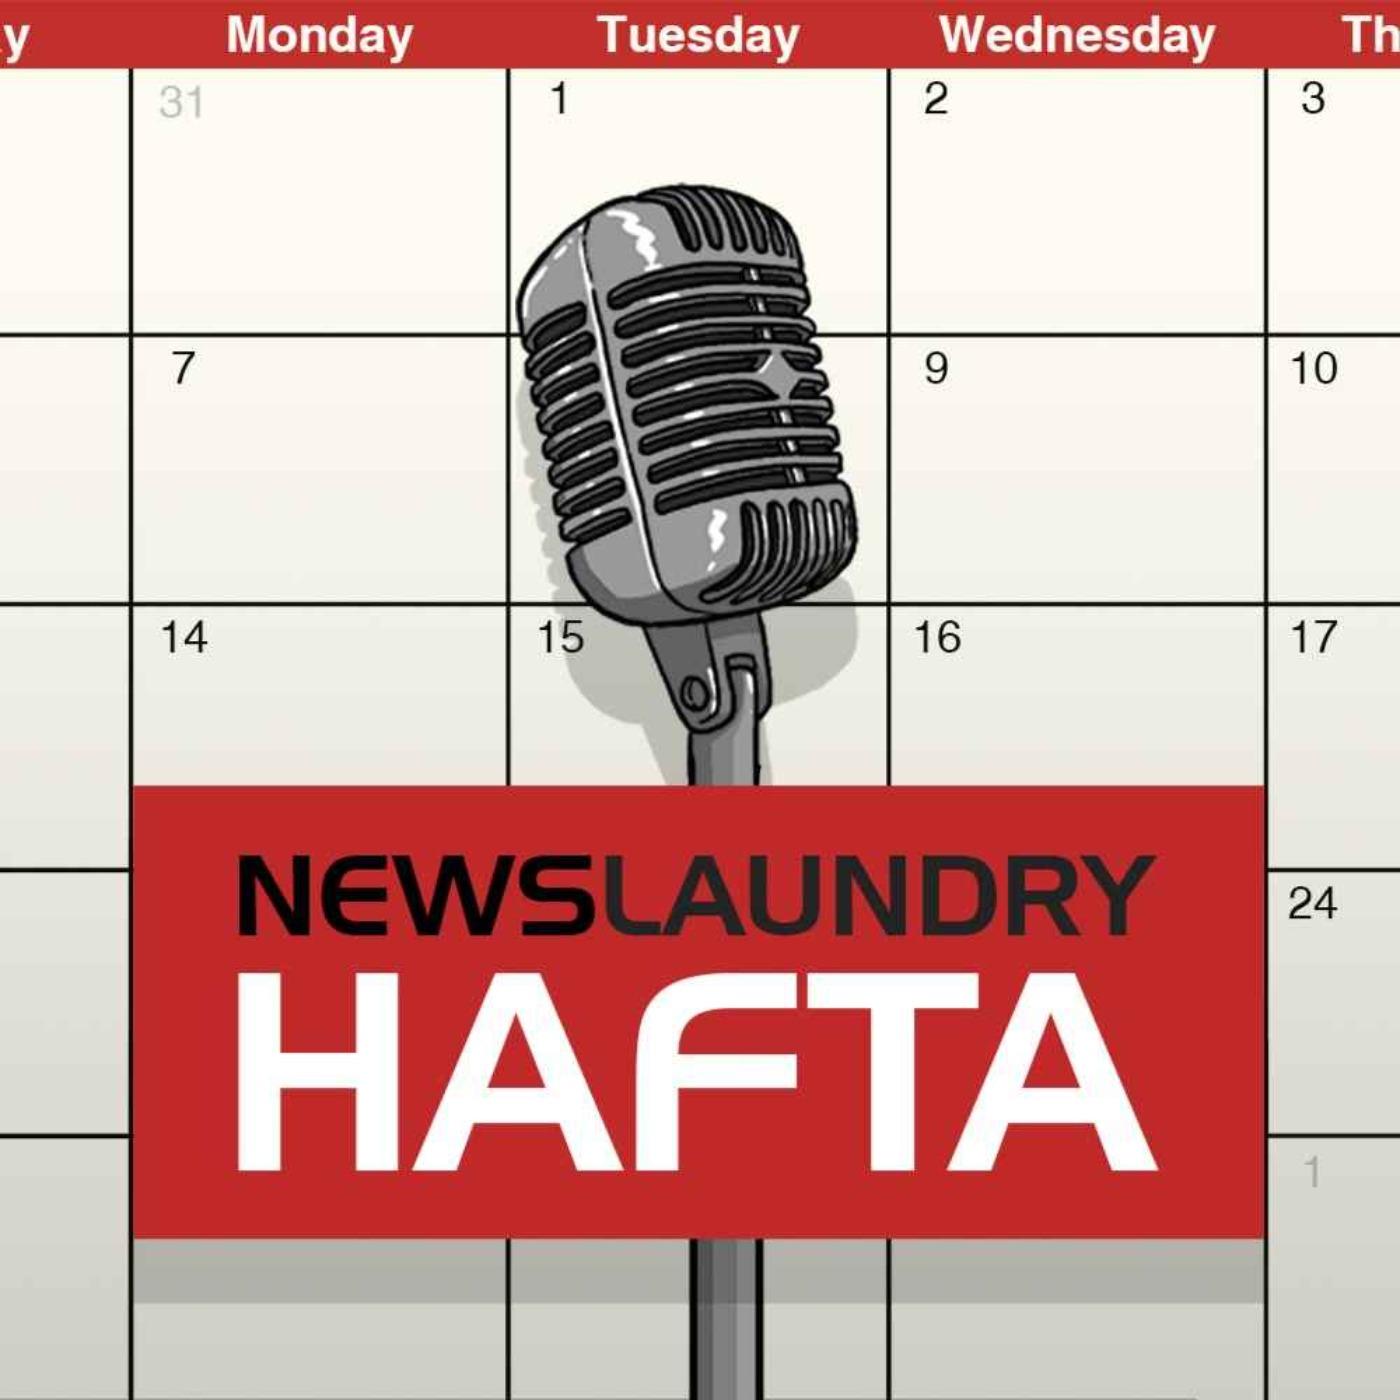 Hafta 296: Hathras rape case, Babri Masjid verdict, and the Trump-Biden presidential debate